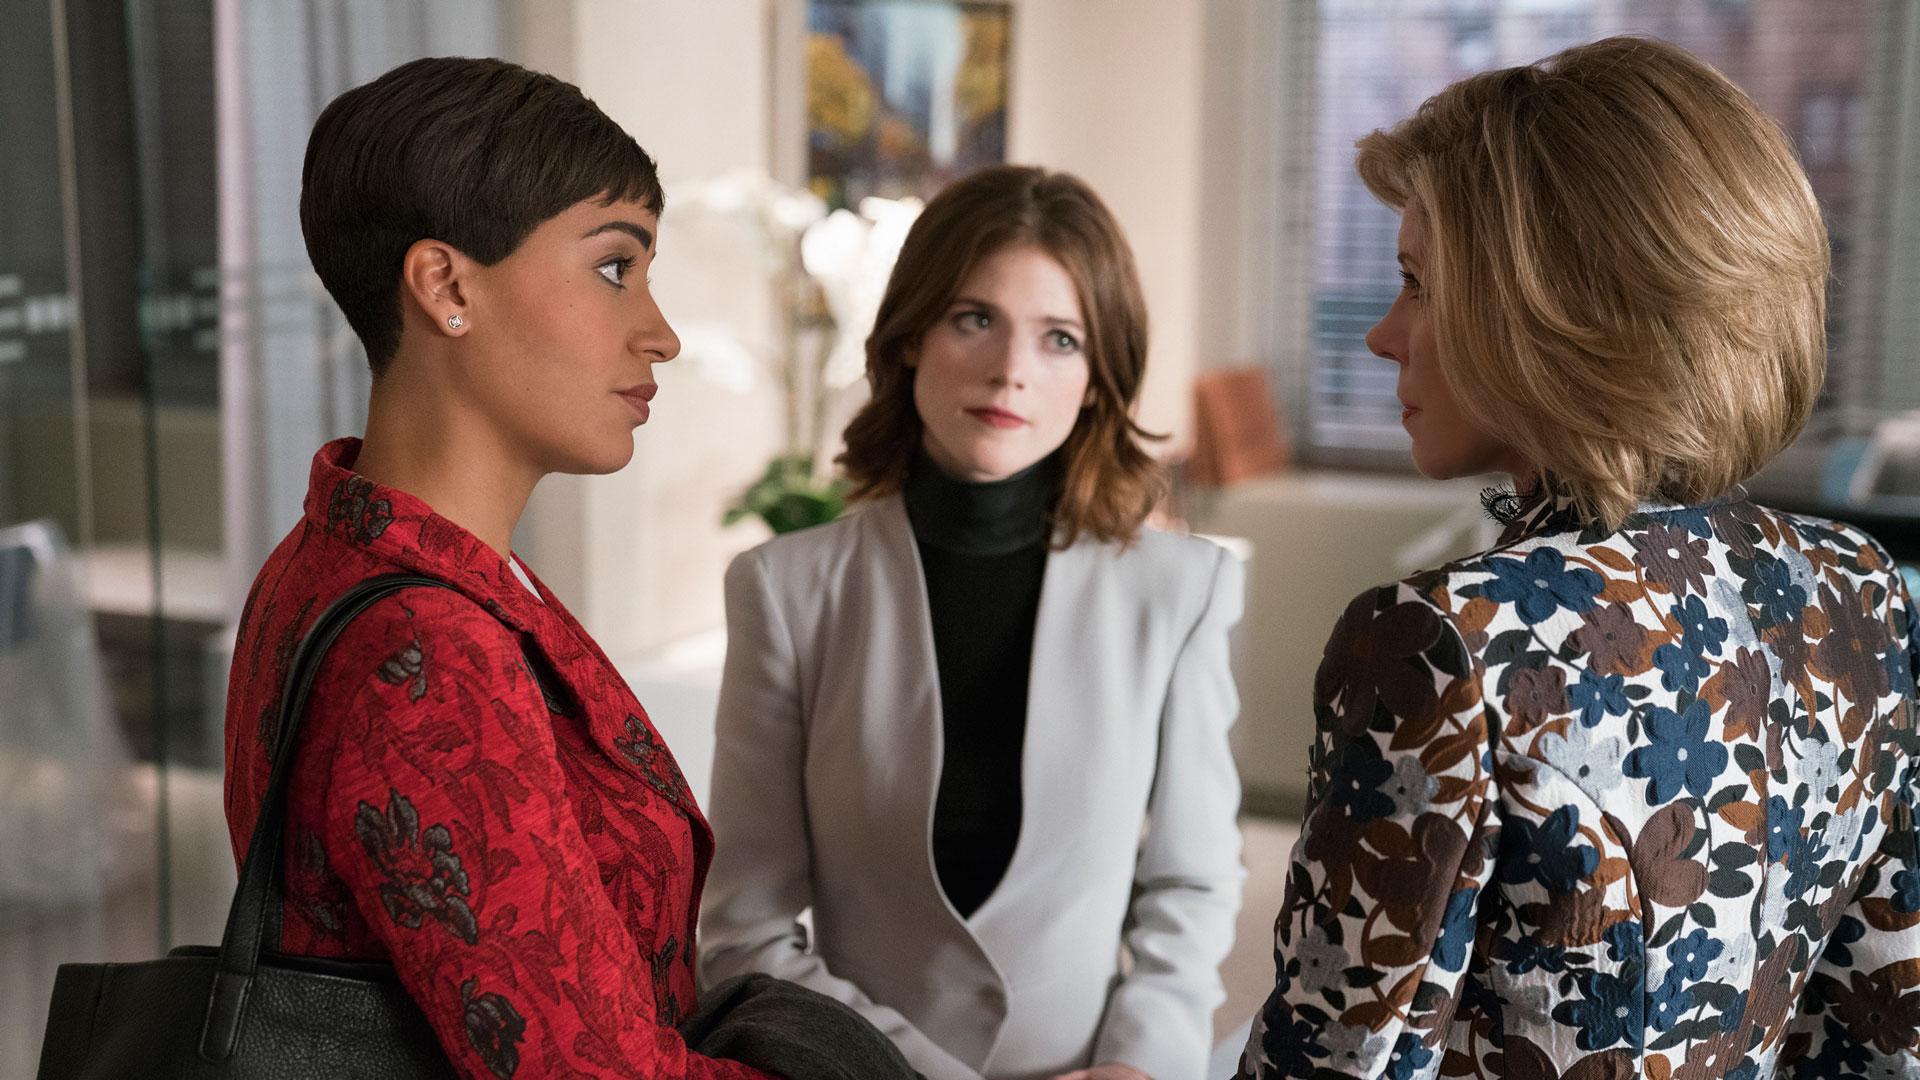 Lucca Quinn (Cush Jumbo), Maia Rindell (Rose Leslie), and Diane Lockhart (Christine Baranski)